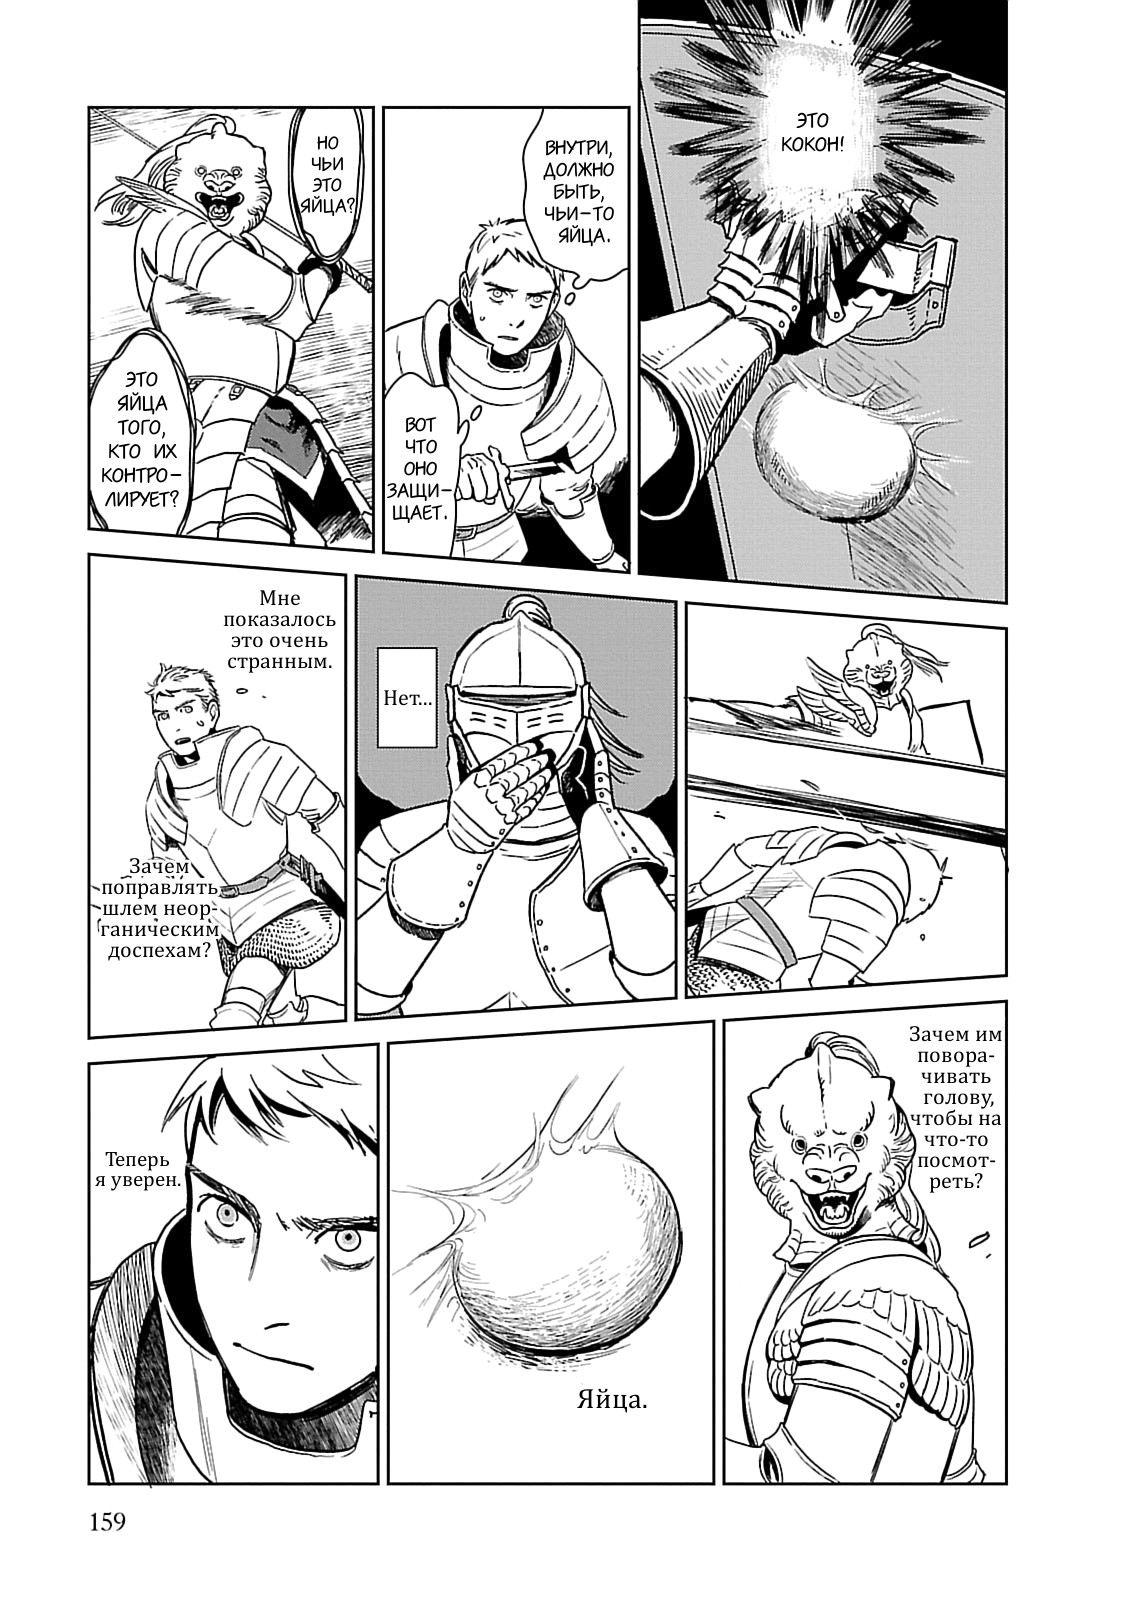 https://r1.ninemanga.com/comics/pic2/50/27634/1256234/1541271092460.jpg Page 23